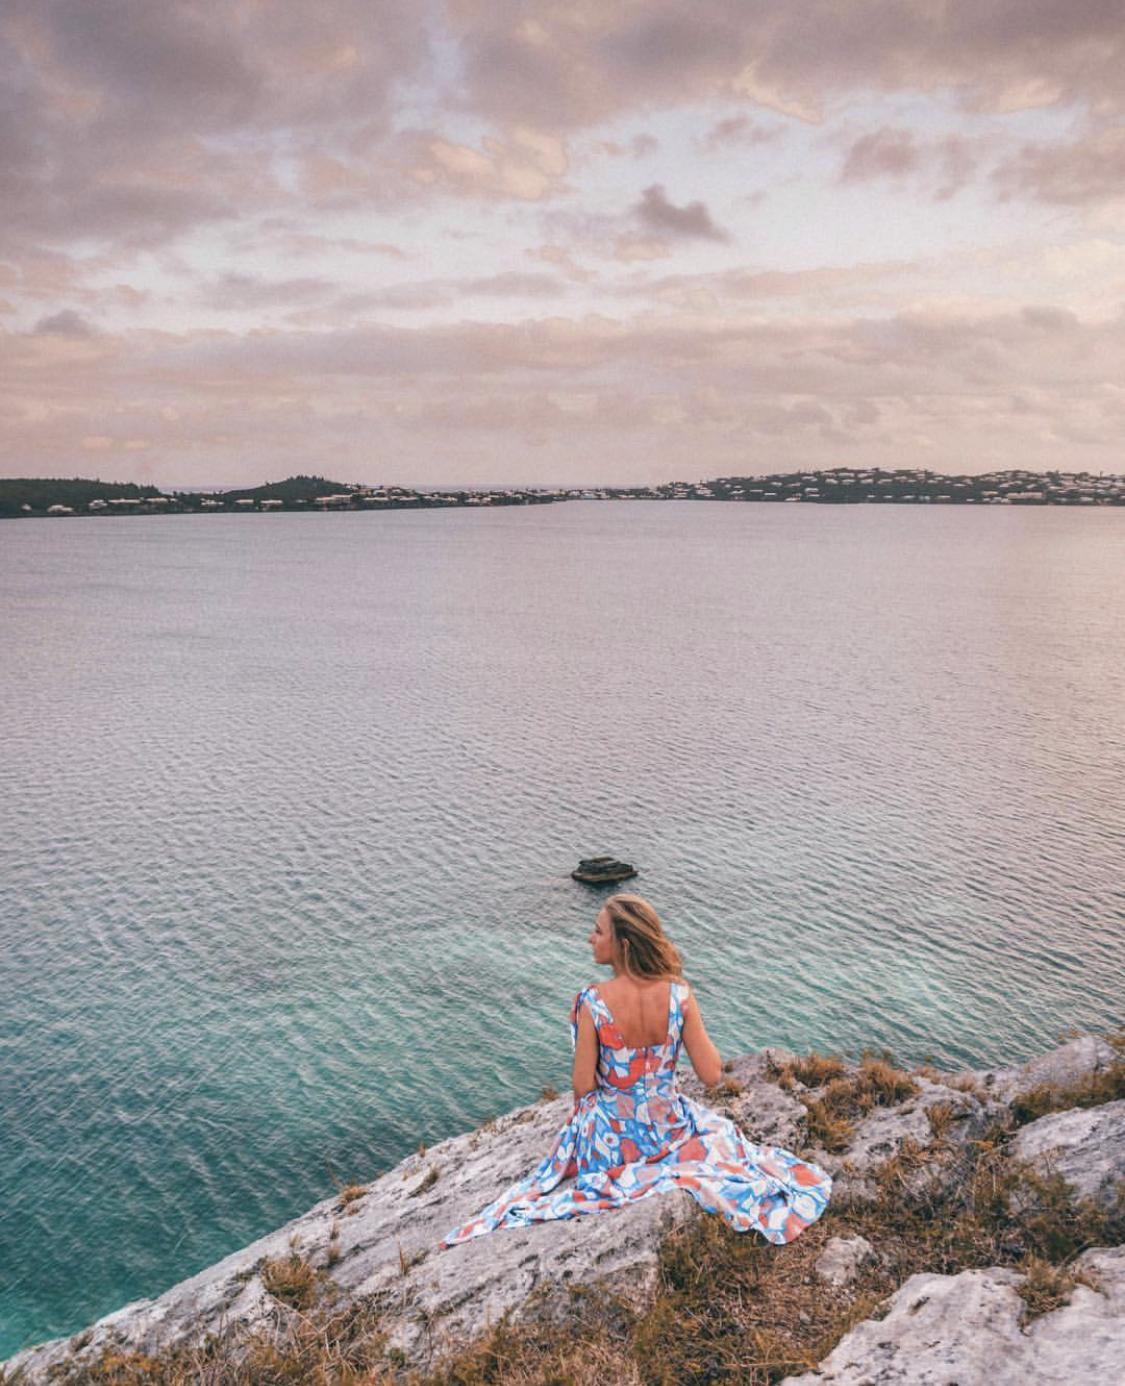 Images - These beautiful shots were taken by @eajeaj - a talented photographer in Bermuda.